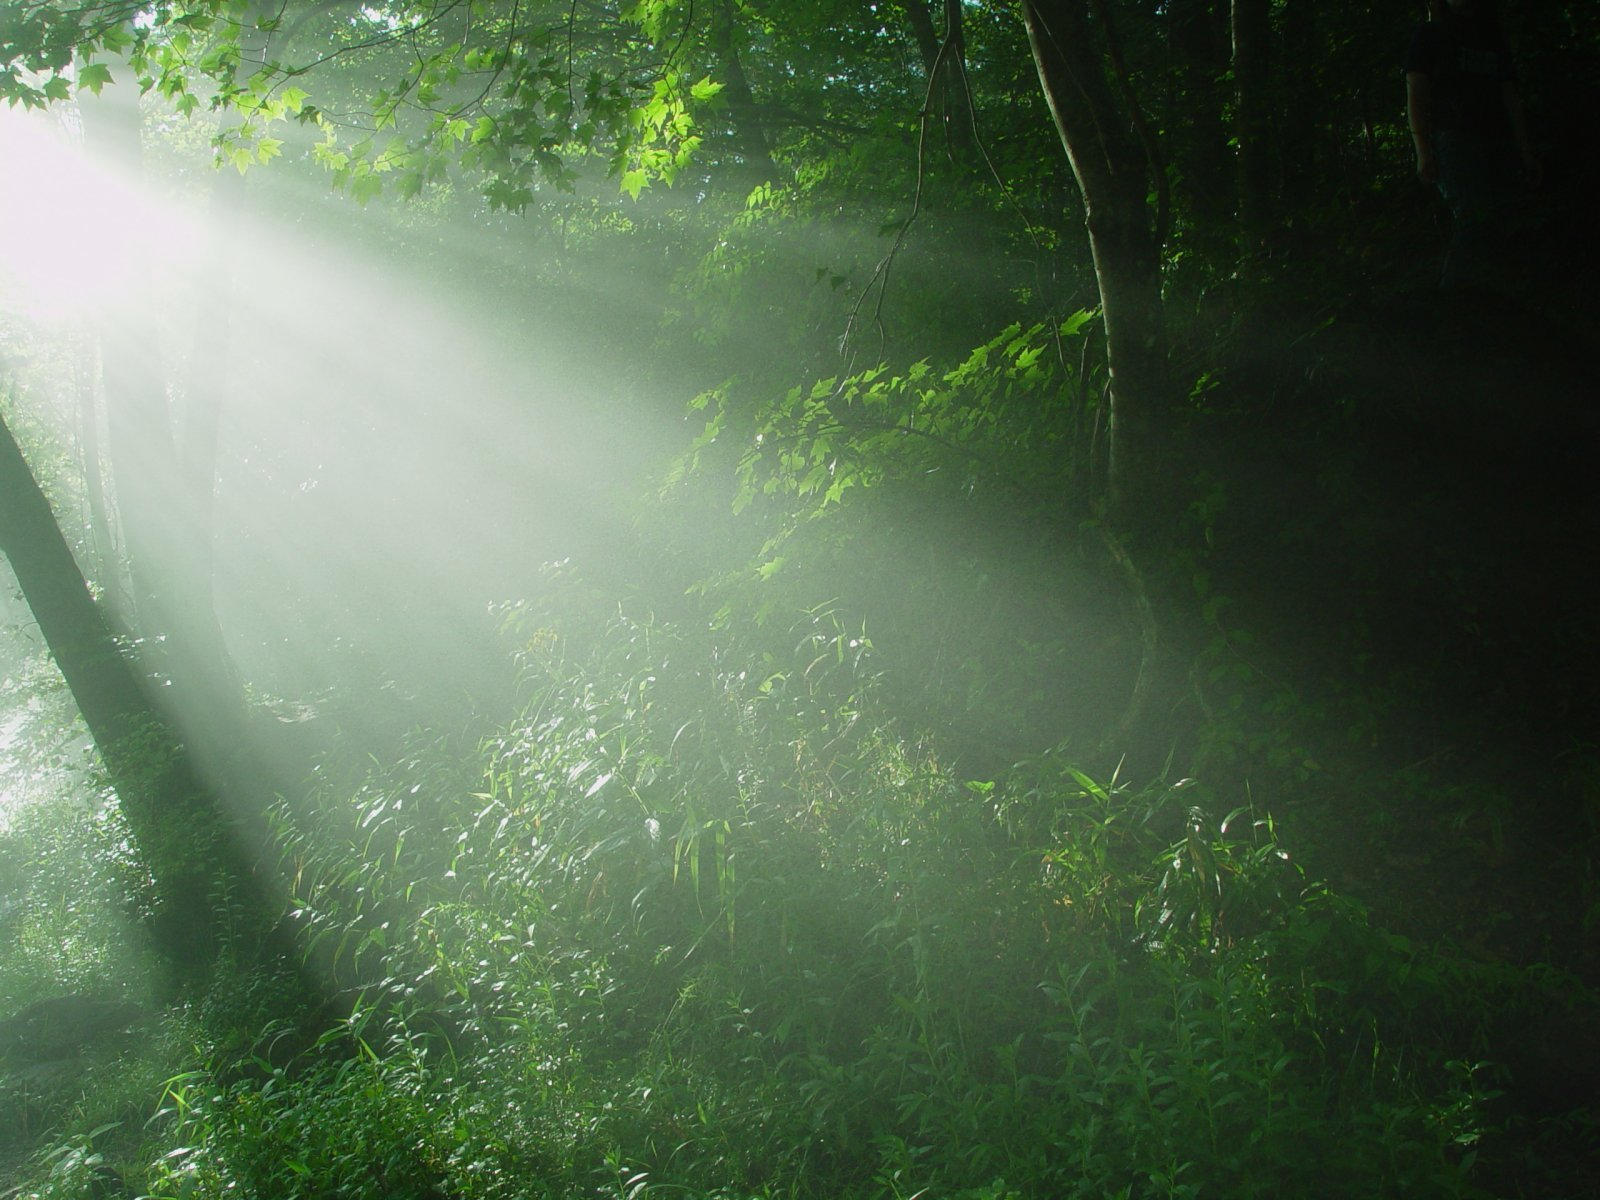 The Magic Forest by riktorsashen